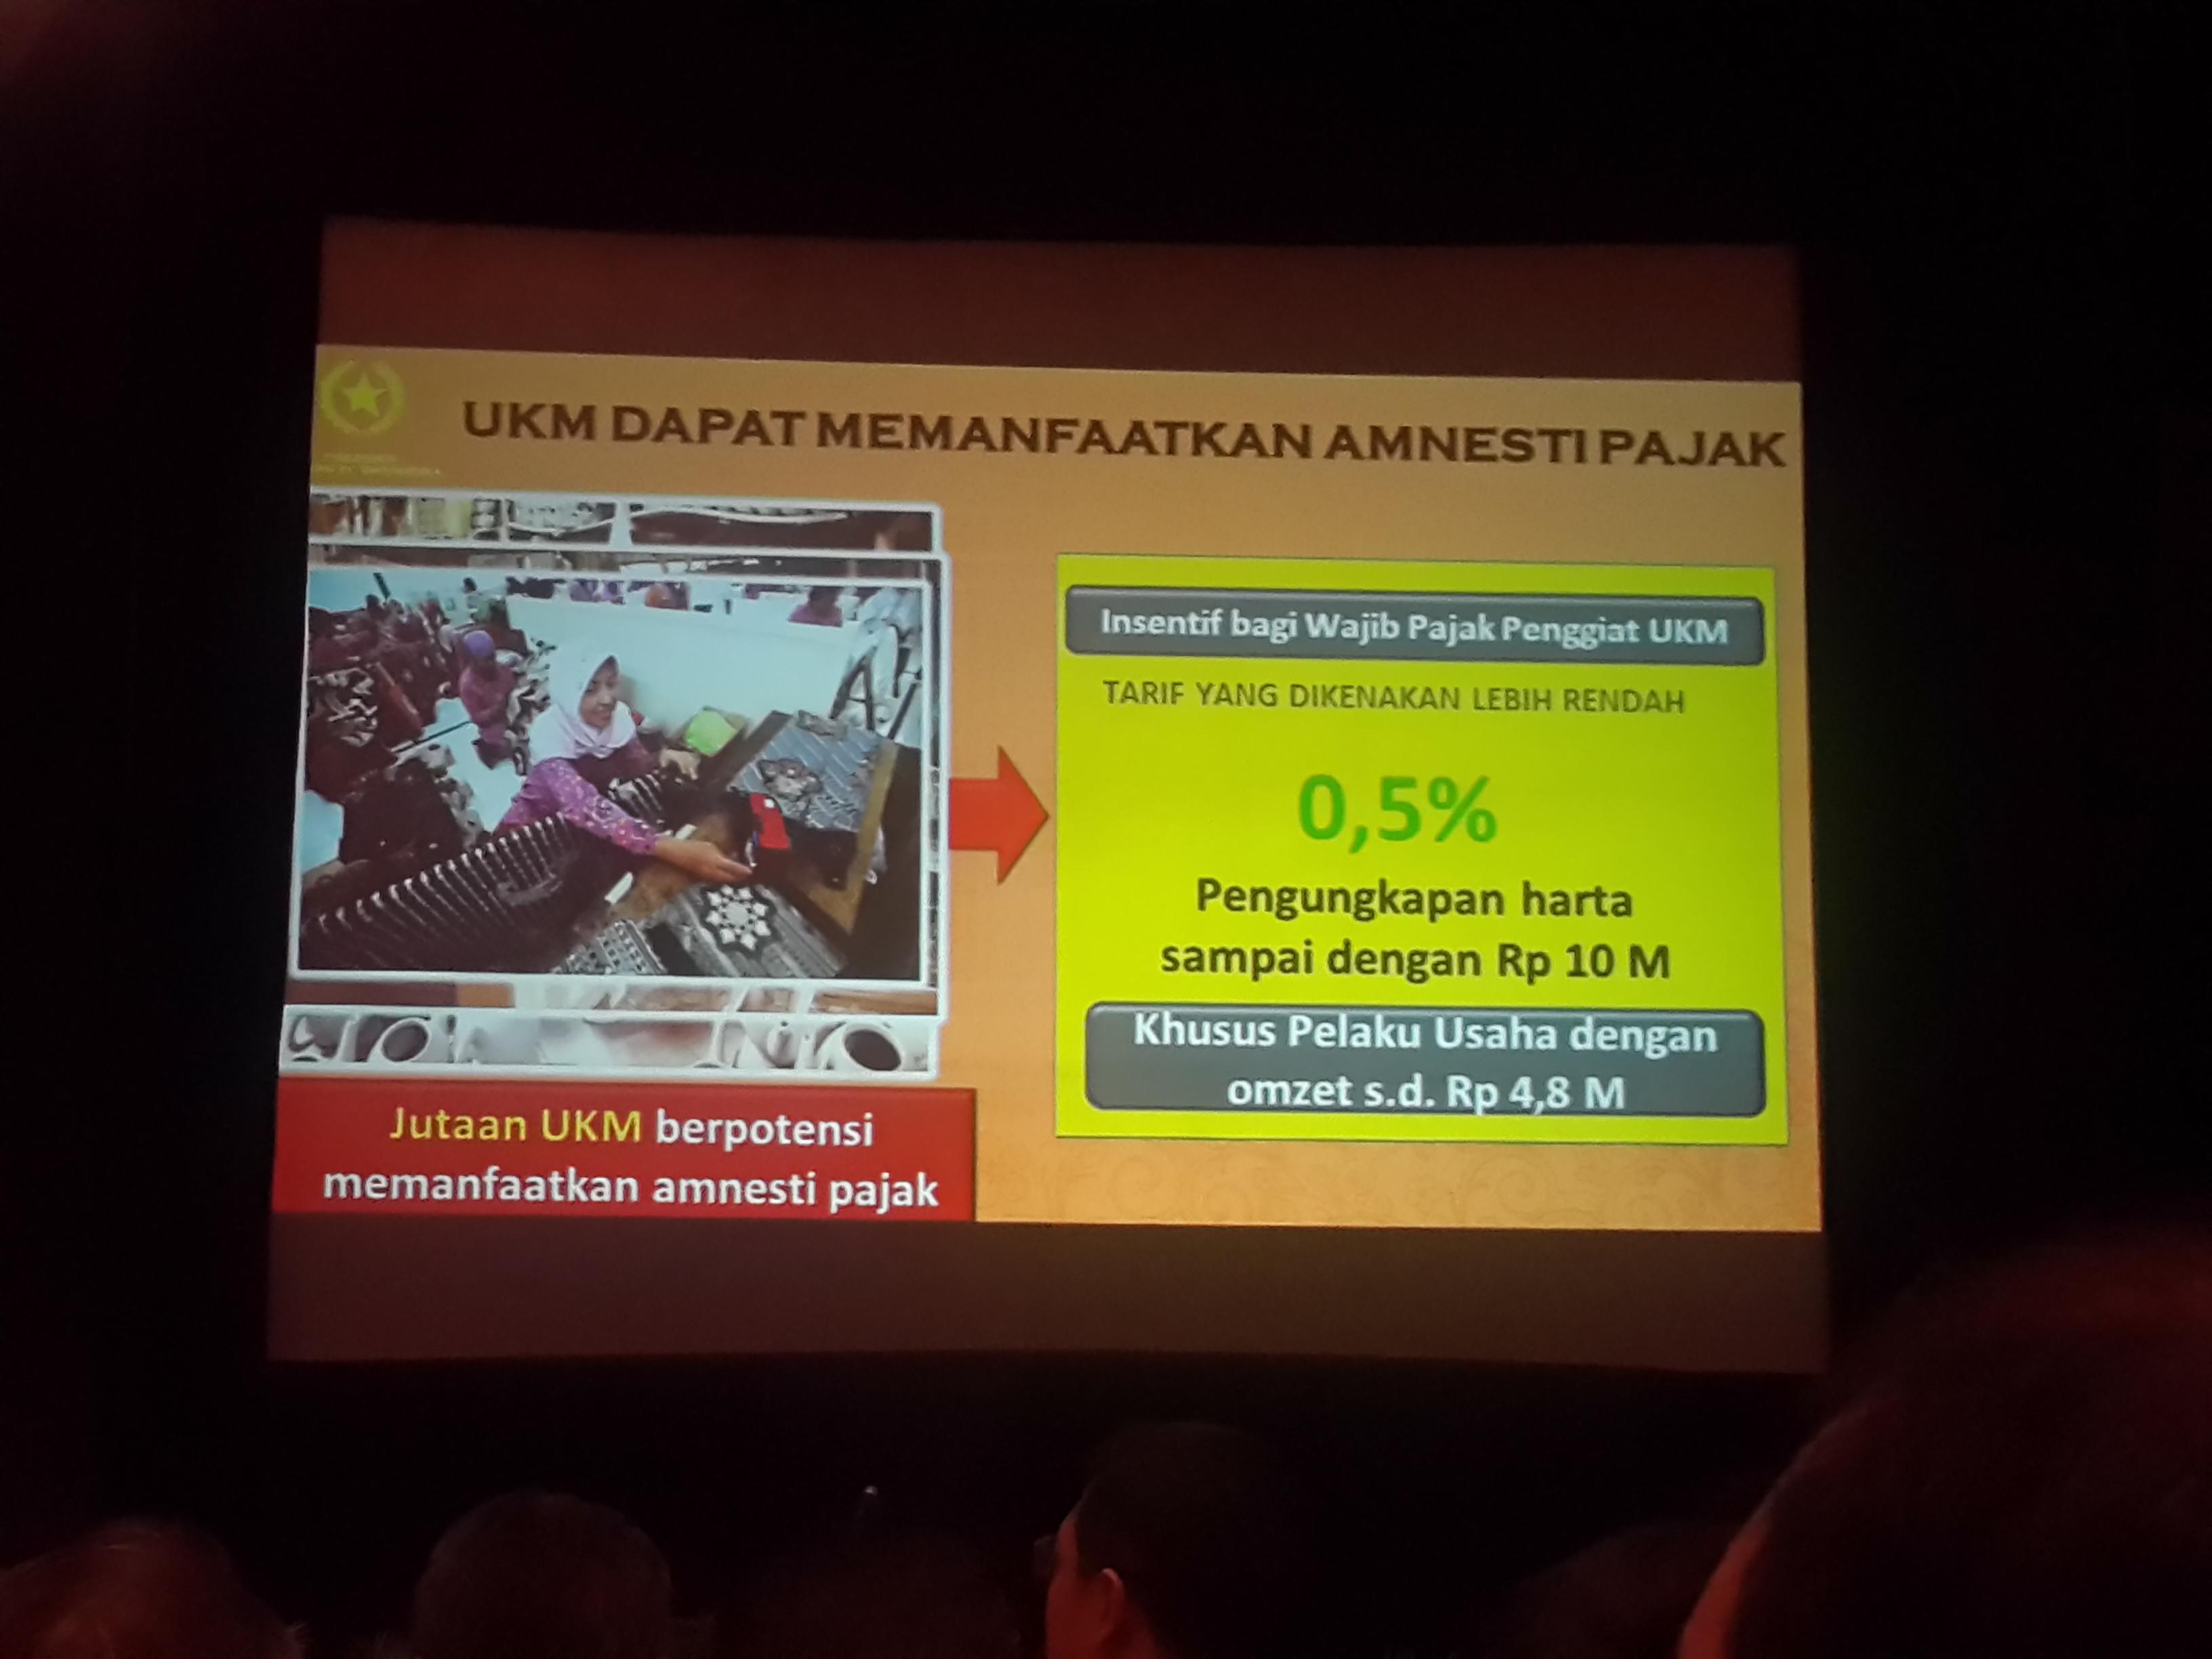 Bagian slide presentasi Presiden Jokowi: UKM Dapat Manfaatkan Tax Amnesty. Foto oleh Uni Lubis/Rappler